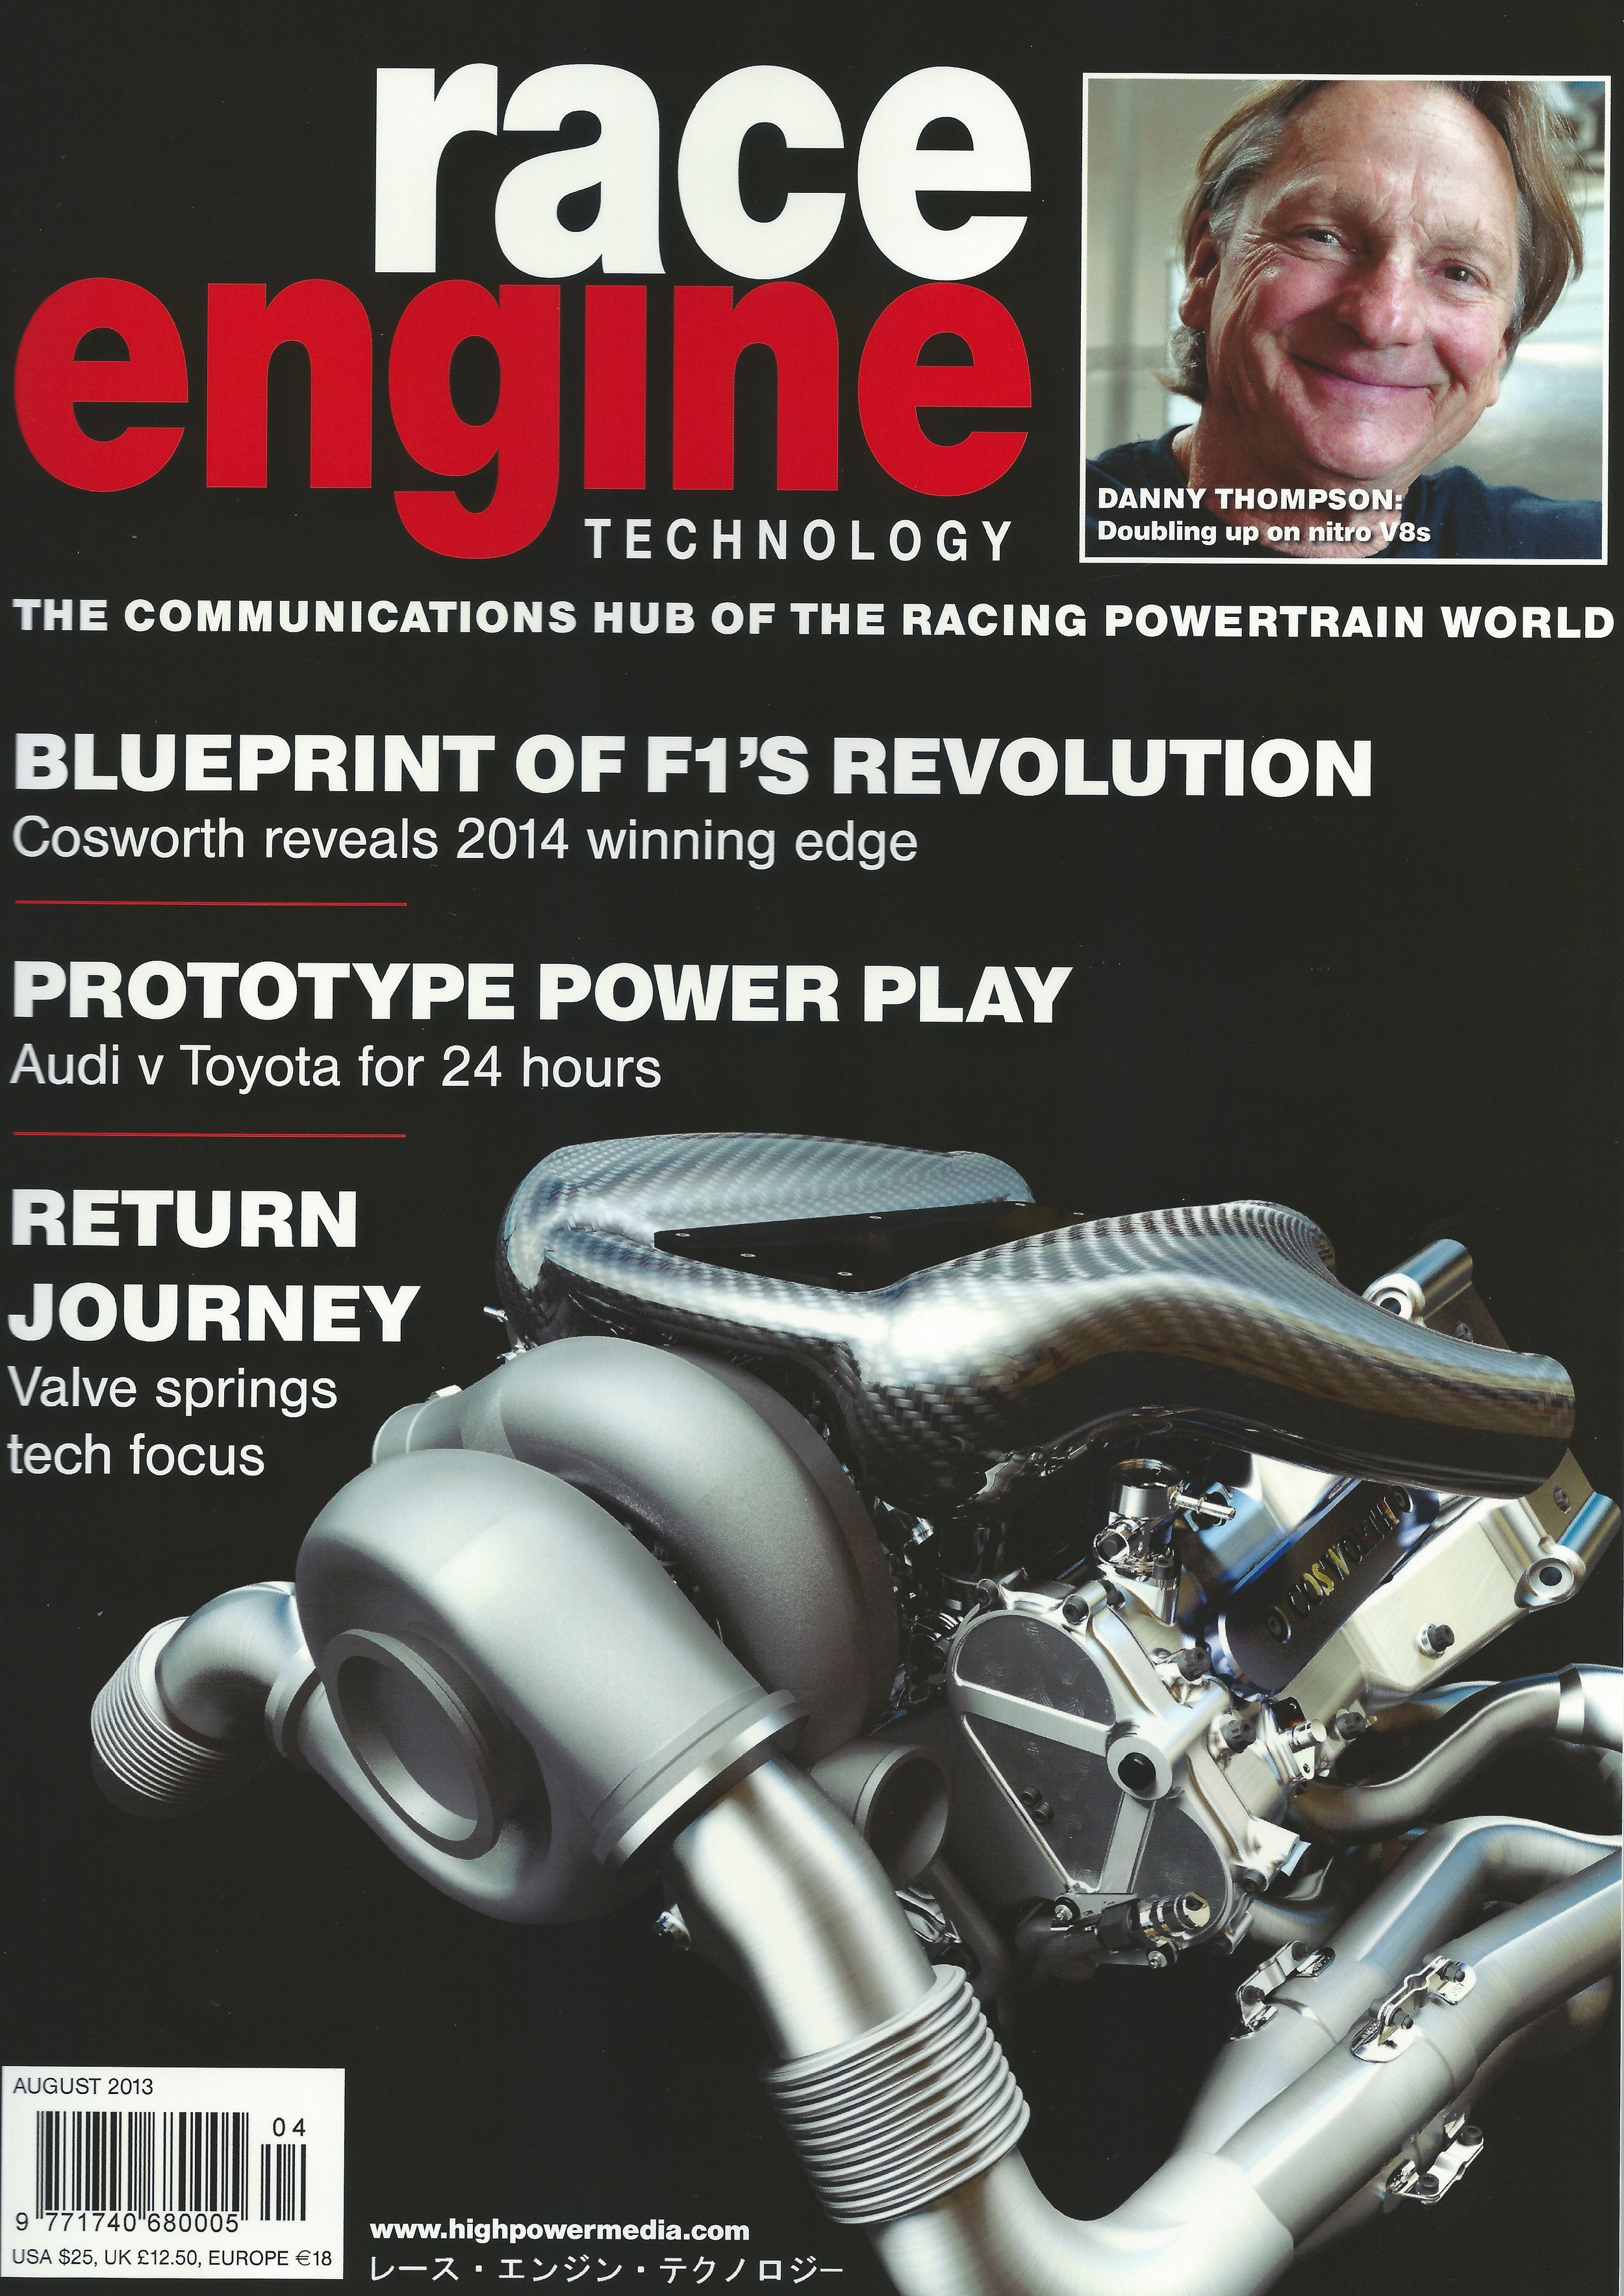 Racer Engine Cover Large.JPG